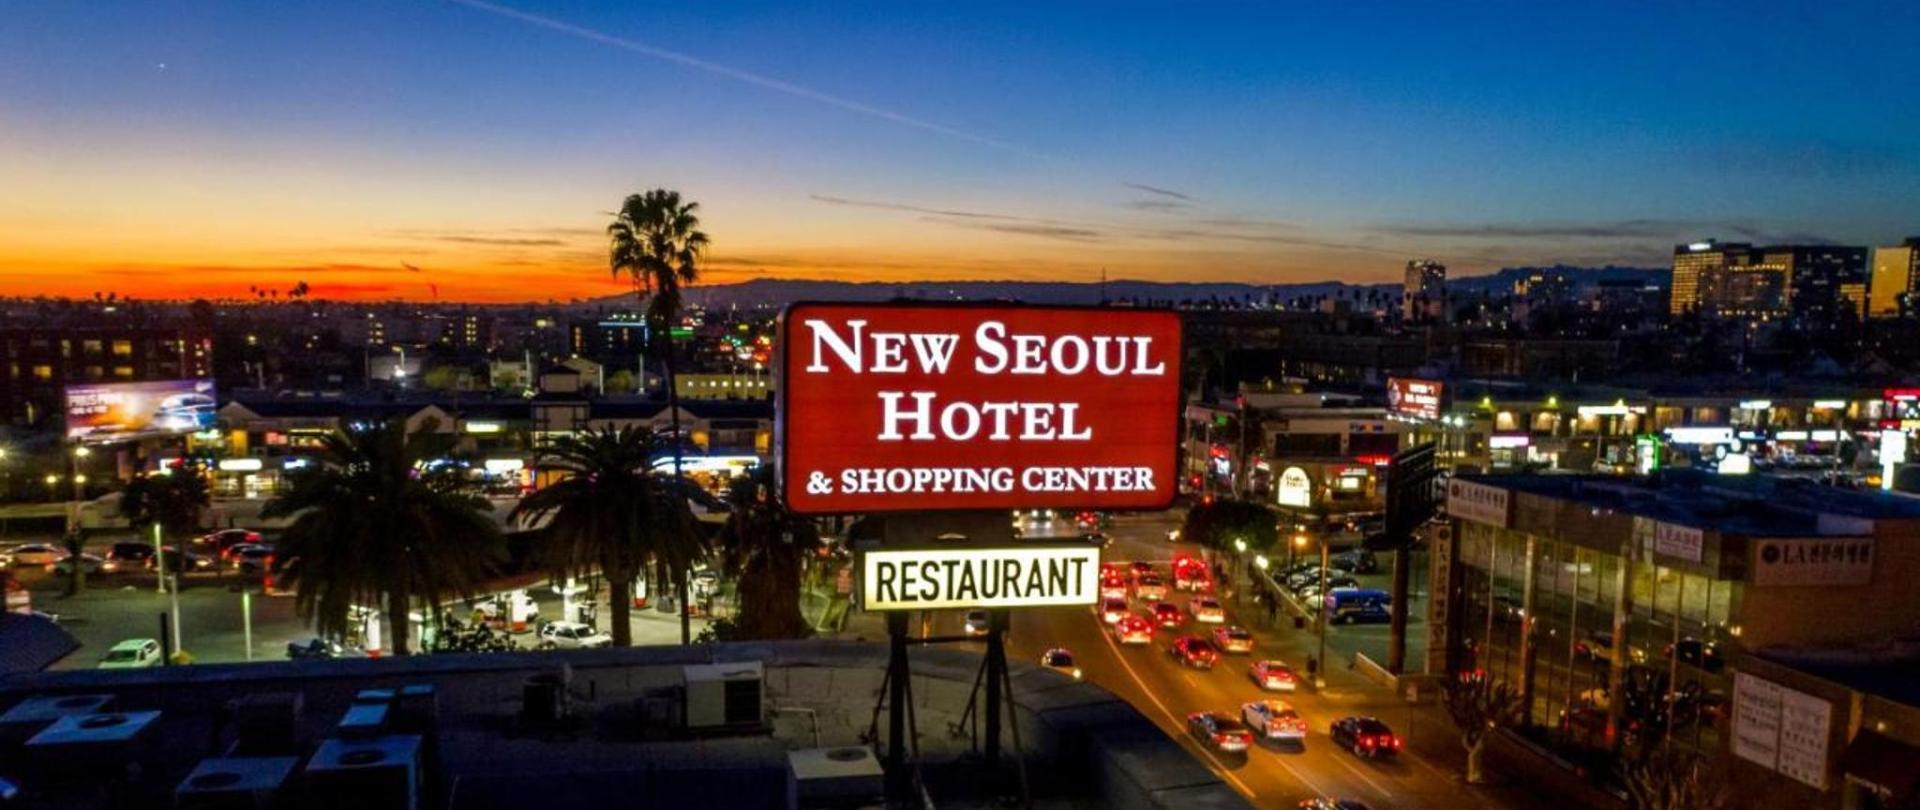 New Seoul Hotel